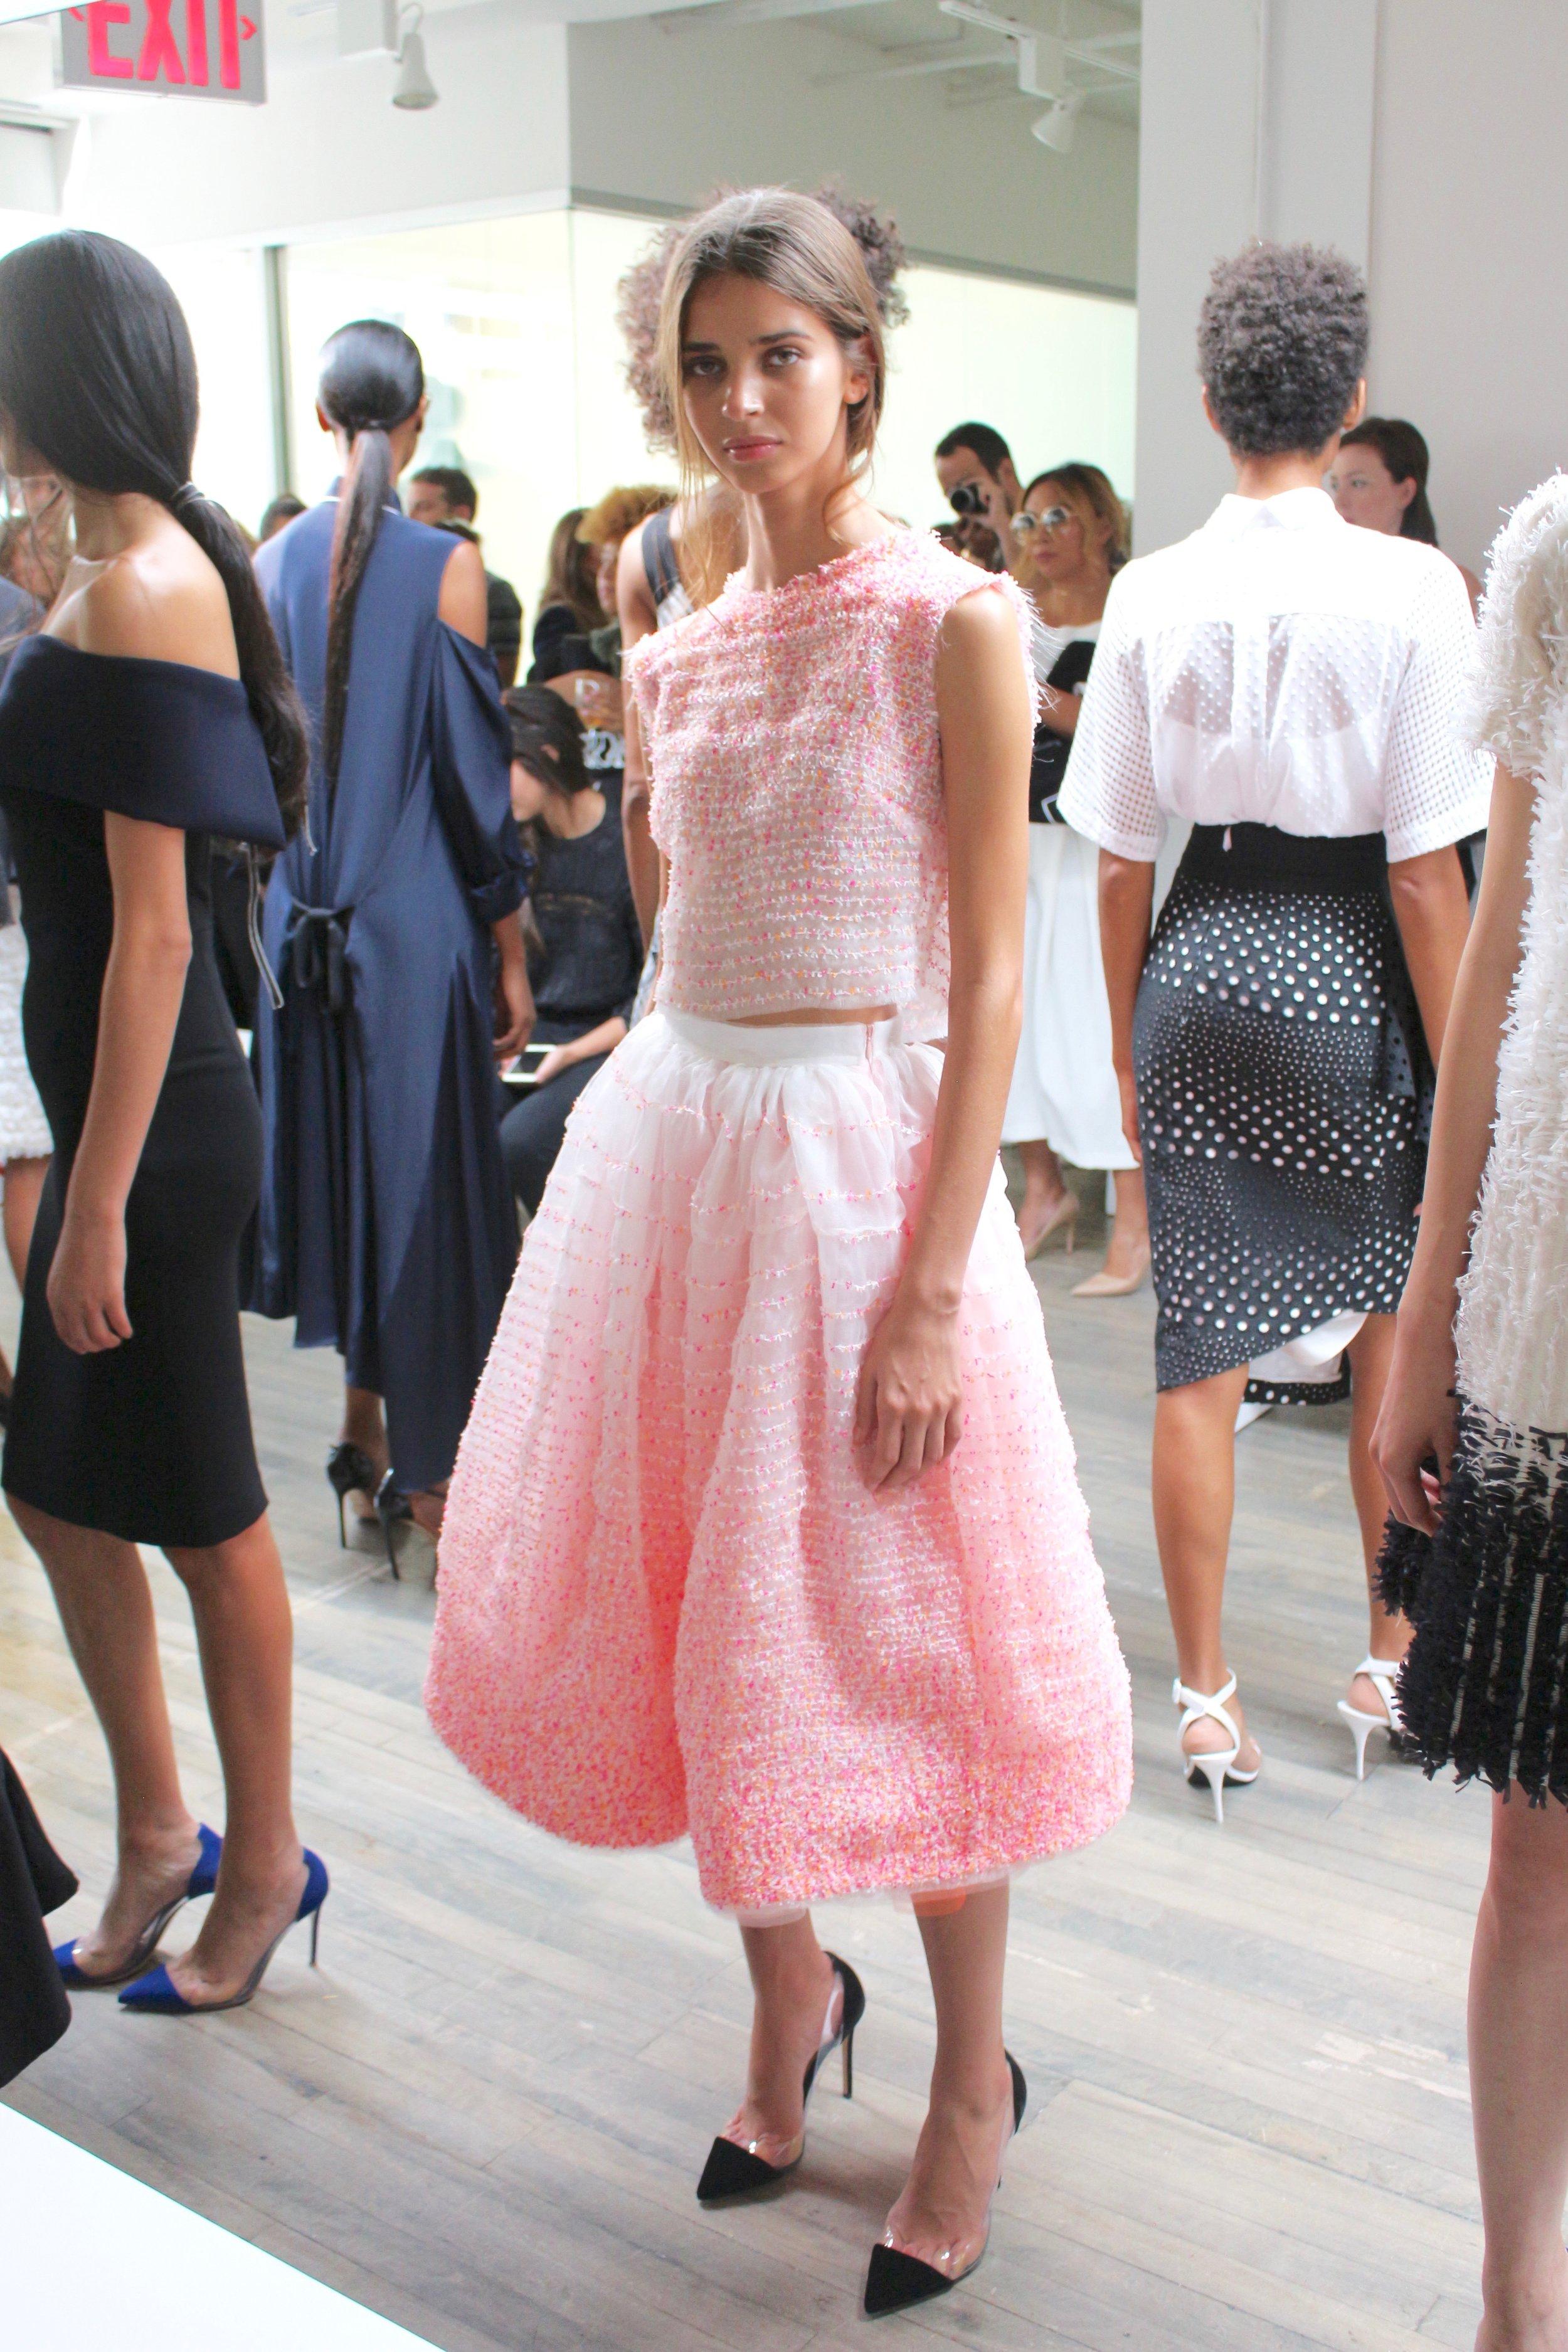 KLS at New York Fashion Week by jasminediane.com